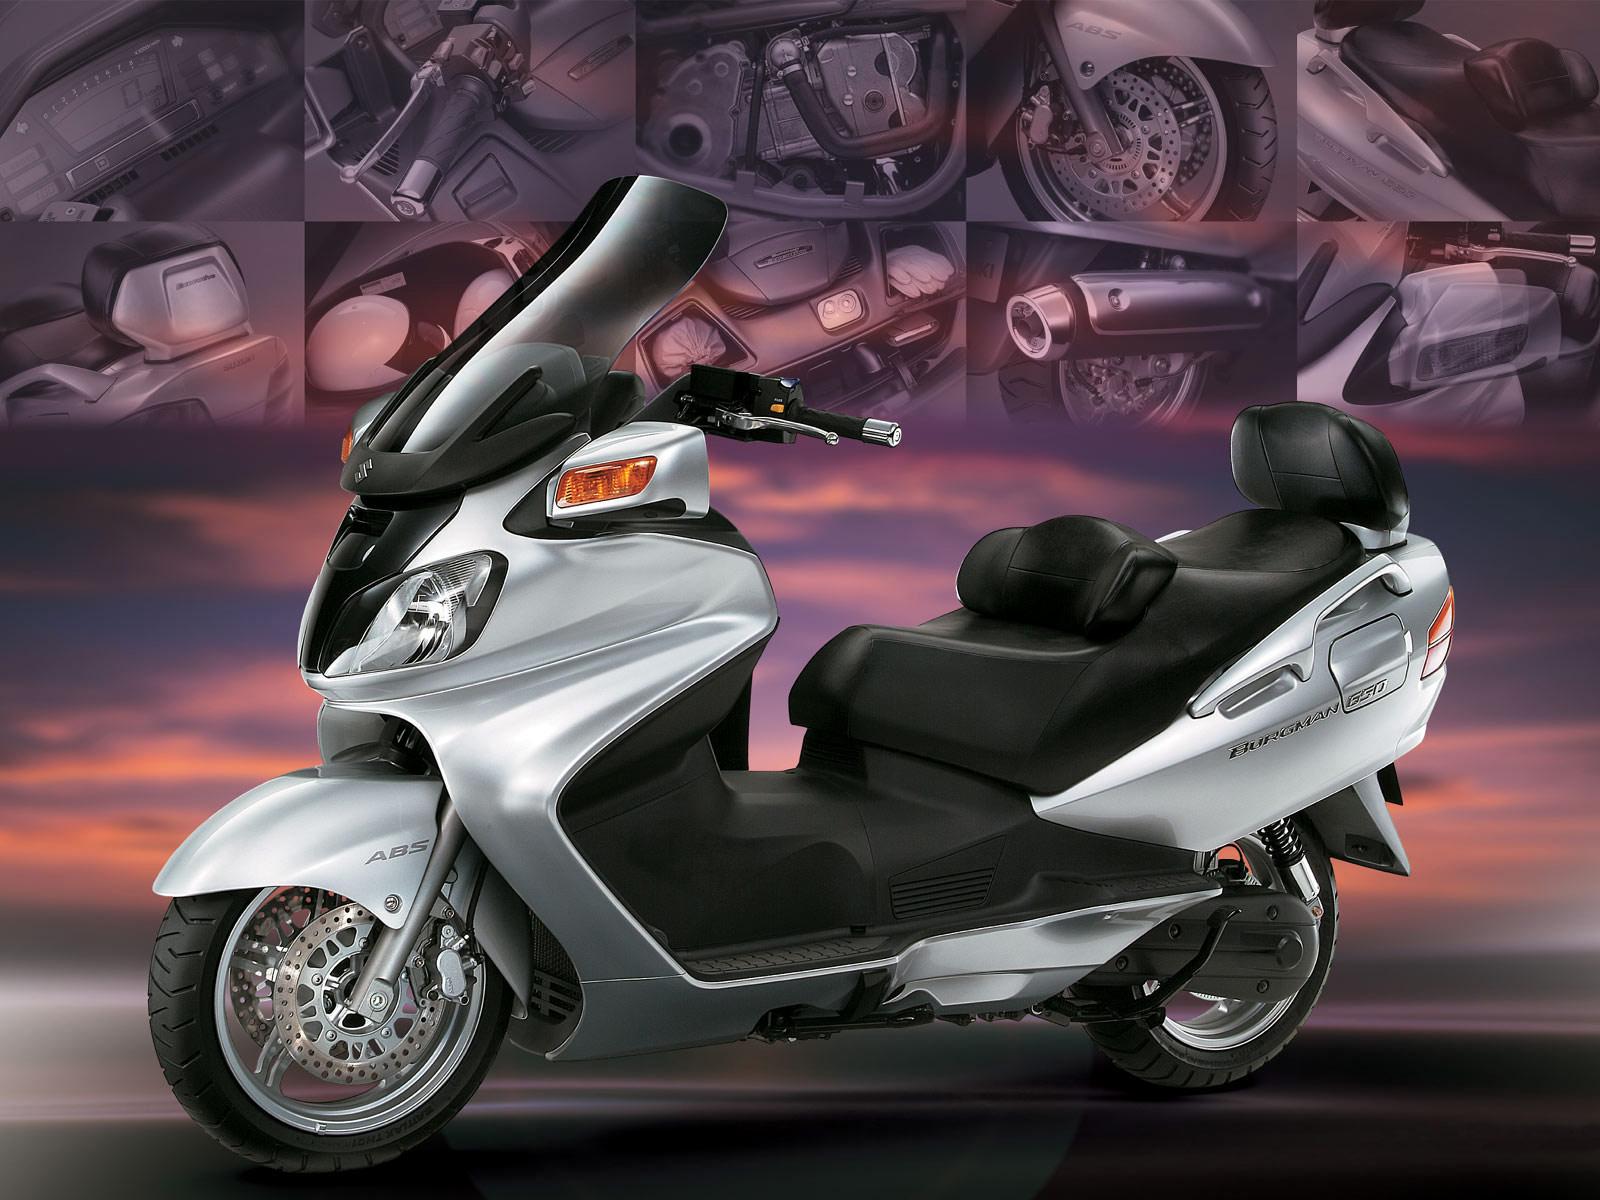 2004 suzuki 650 burgman scooter pictures accident lawyers info. Black Bedroom Furniture Sets. Home Design Ideas